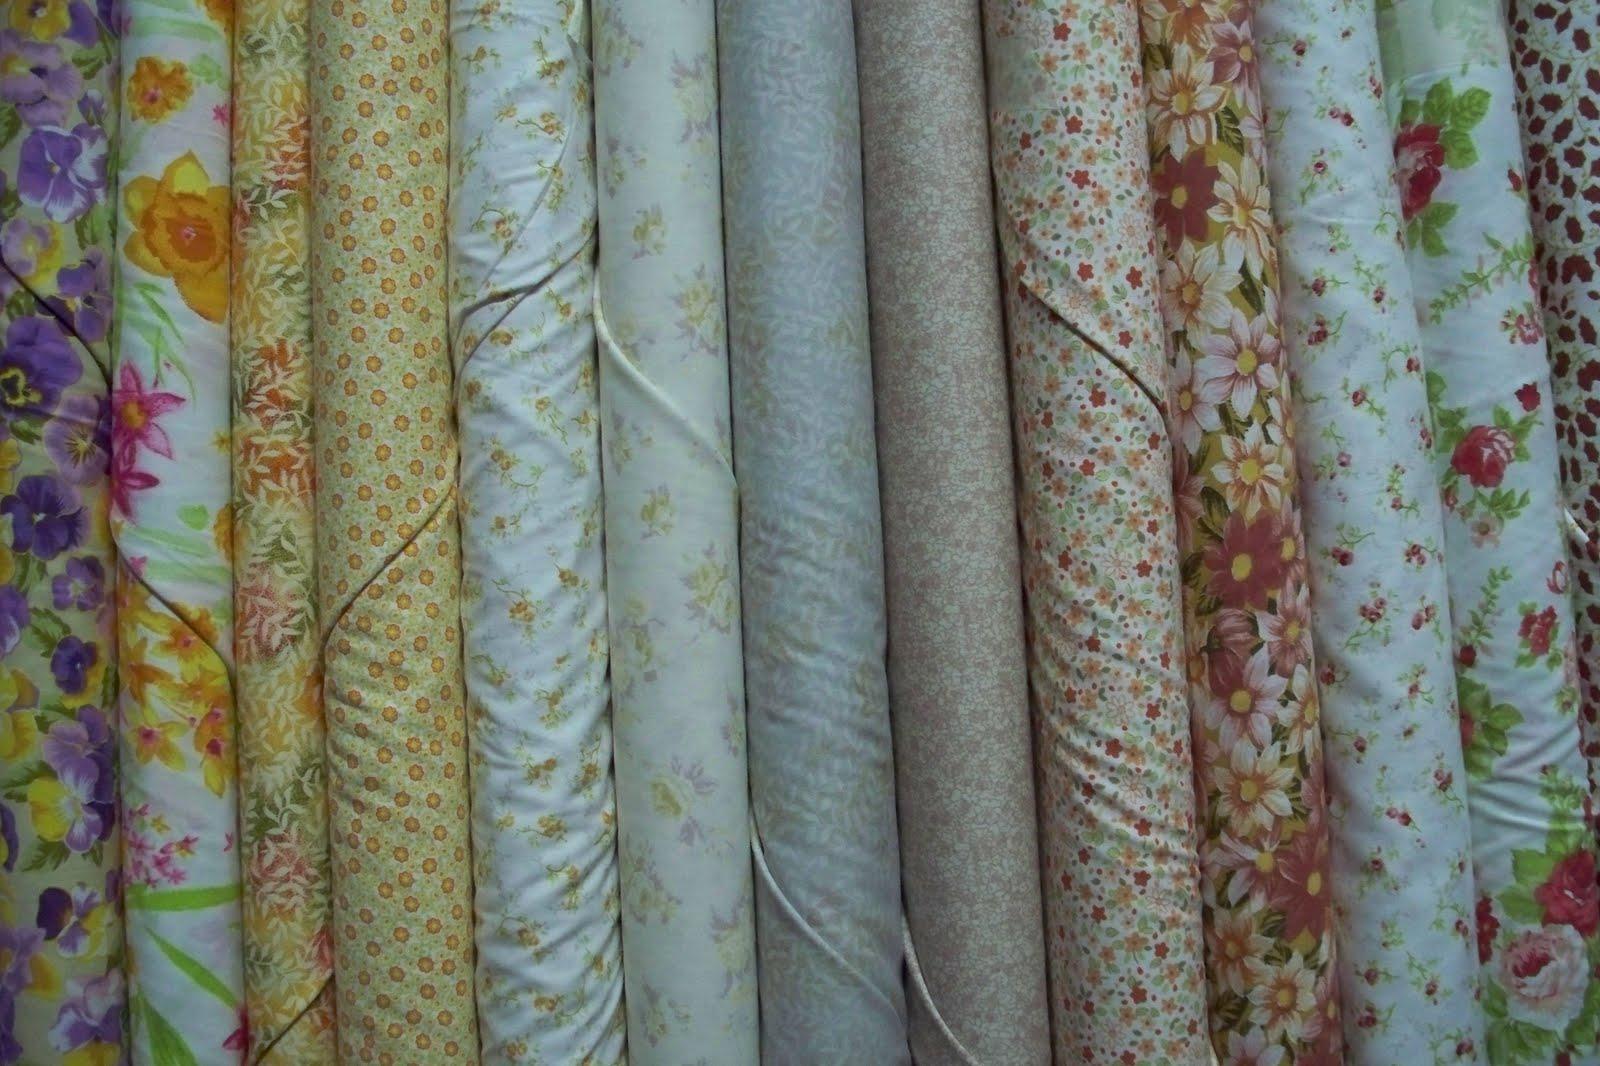 The quilt shop telas brasile as en the quilt shop - Telas para tapiceria precios ...